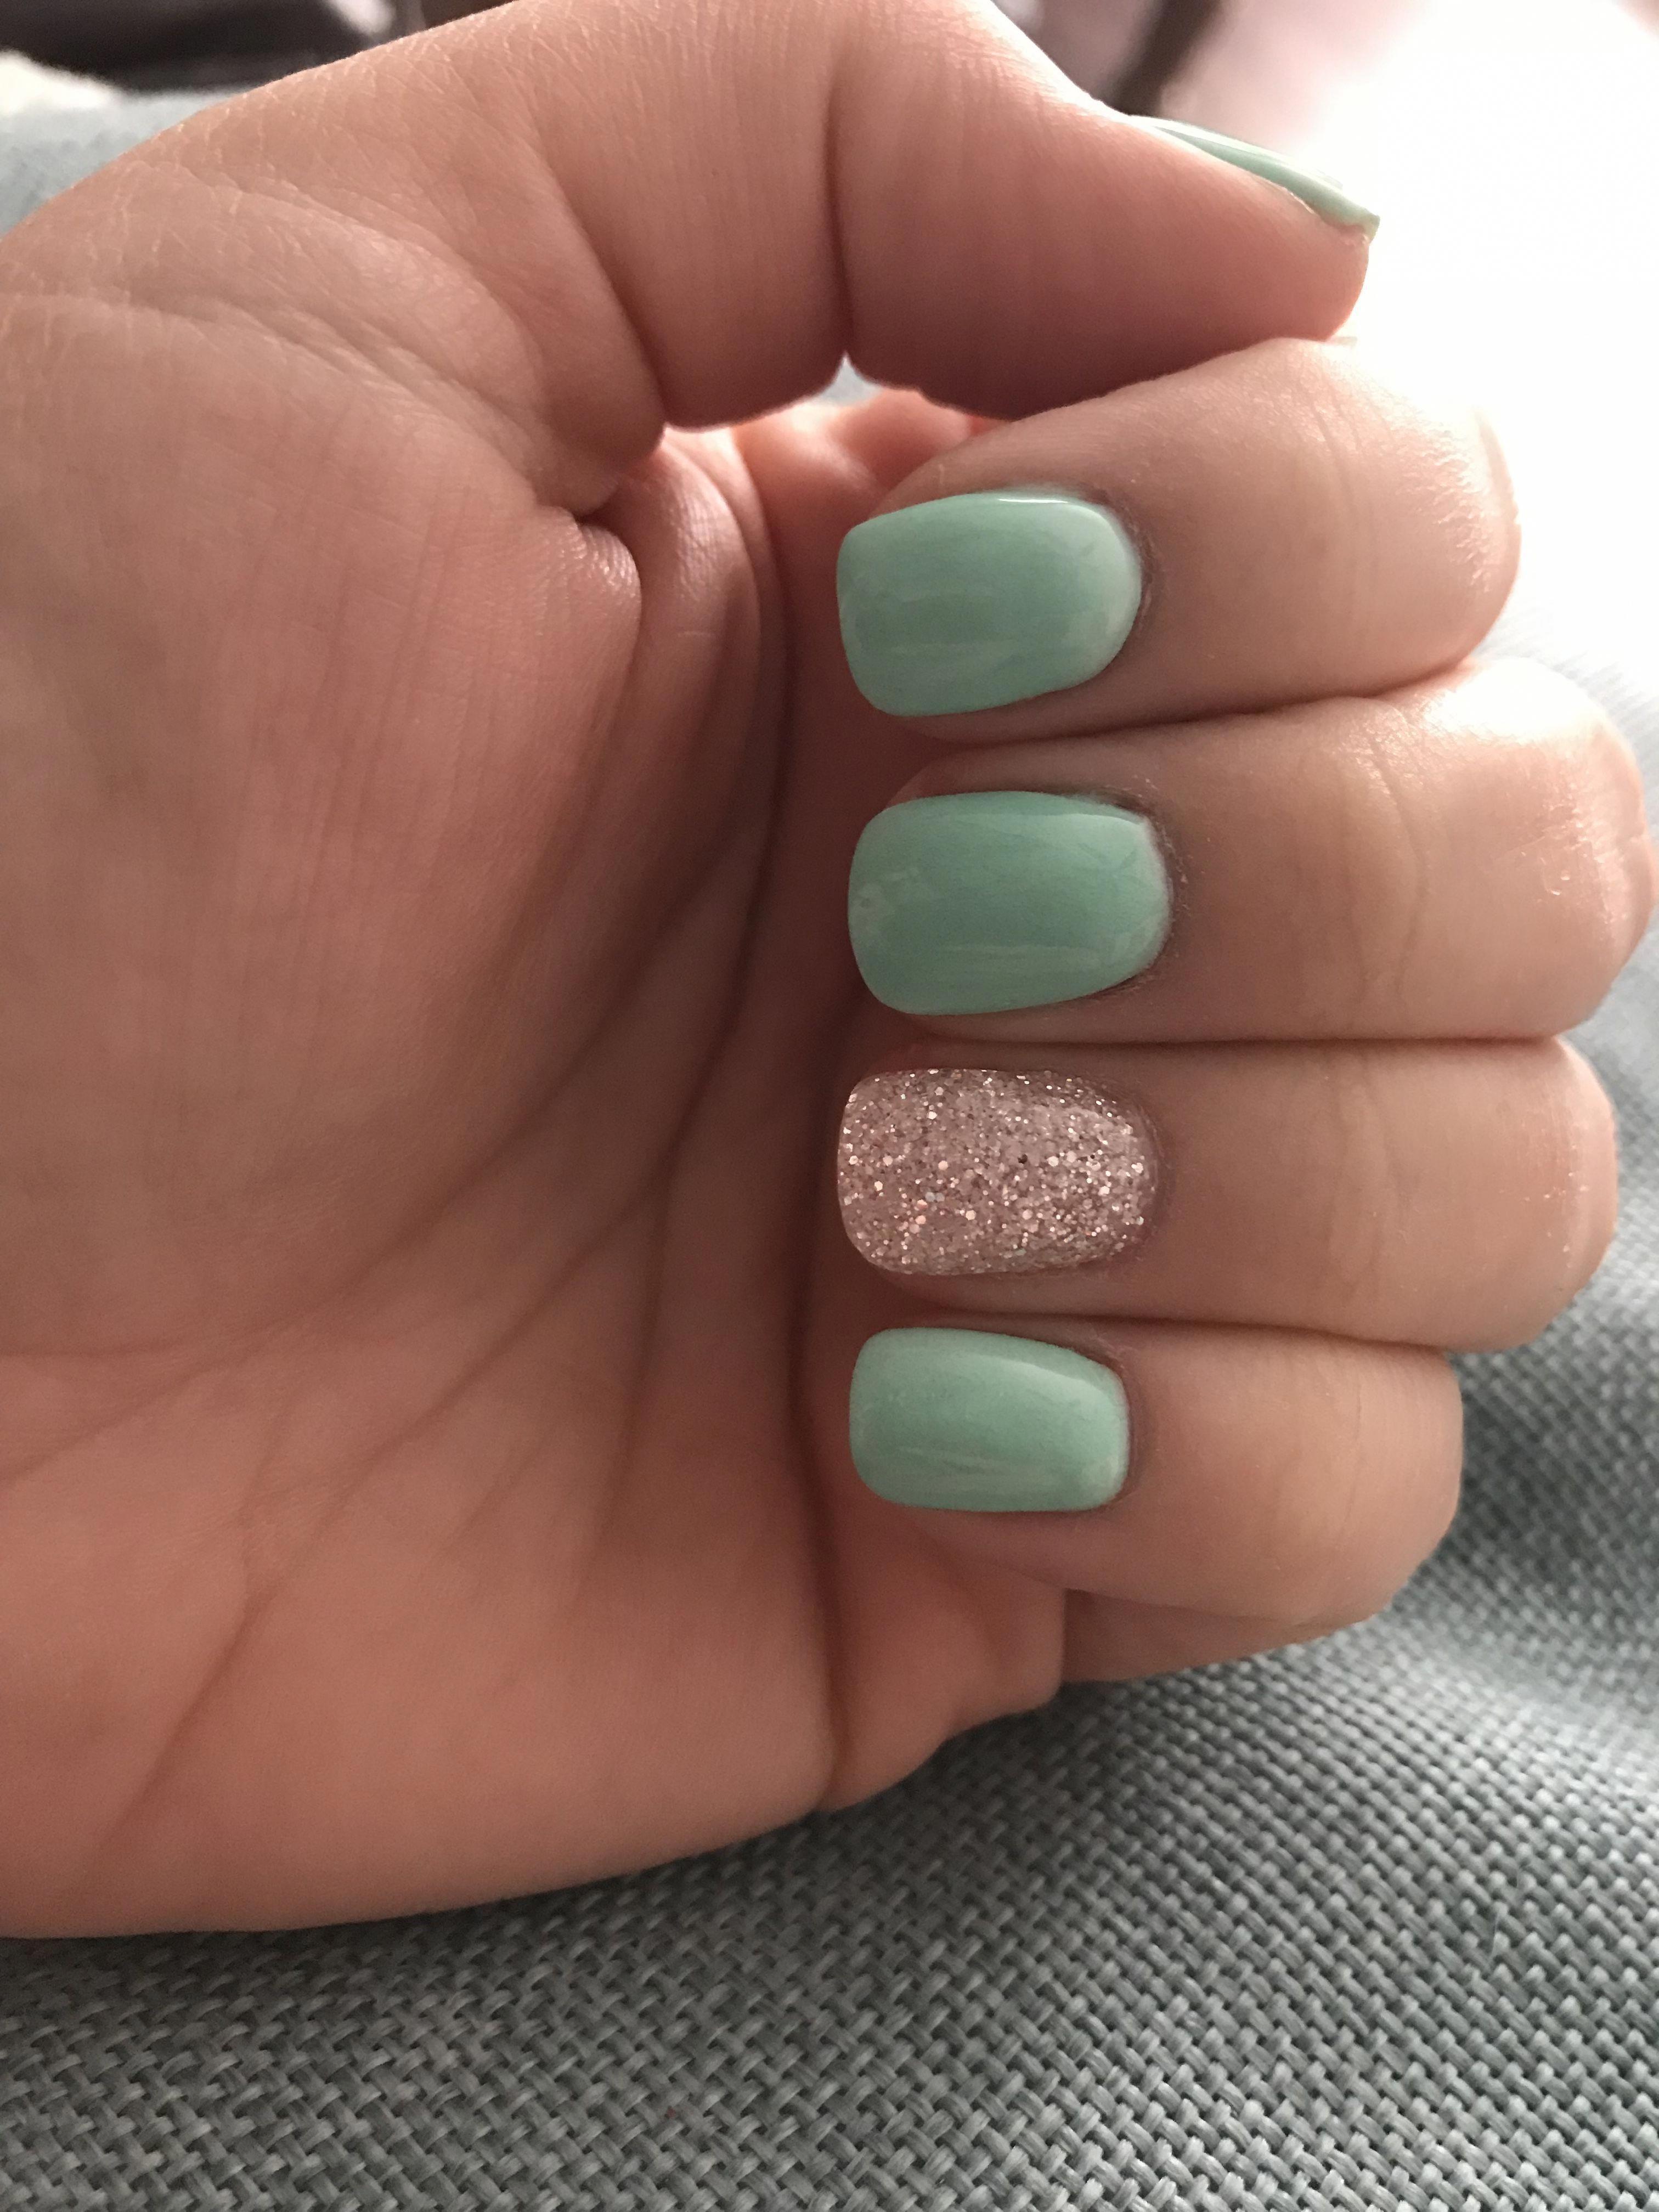 Mint Nails Dipped Nails Glitter Geekynailsdesigns Design Nehtu Nehty Design